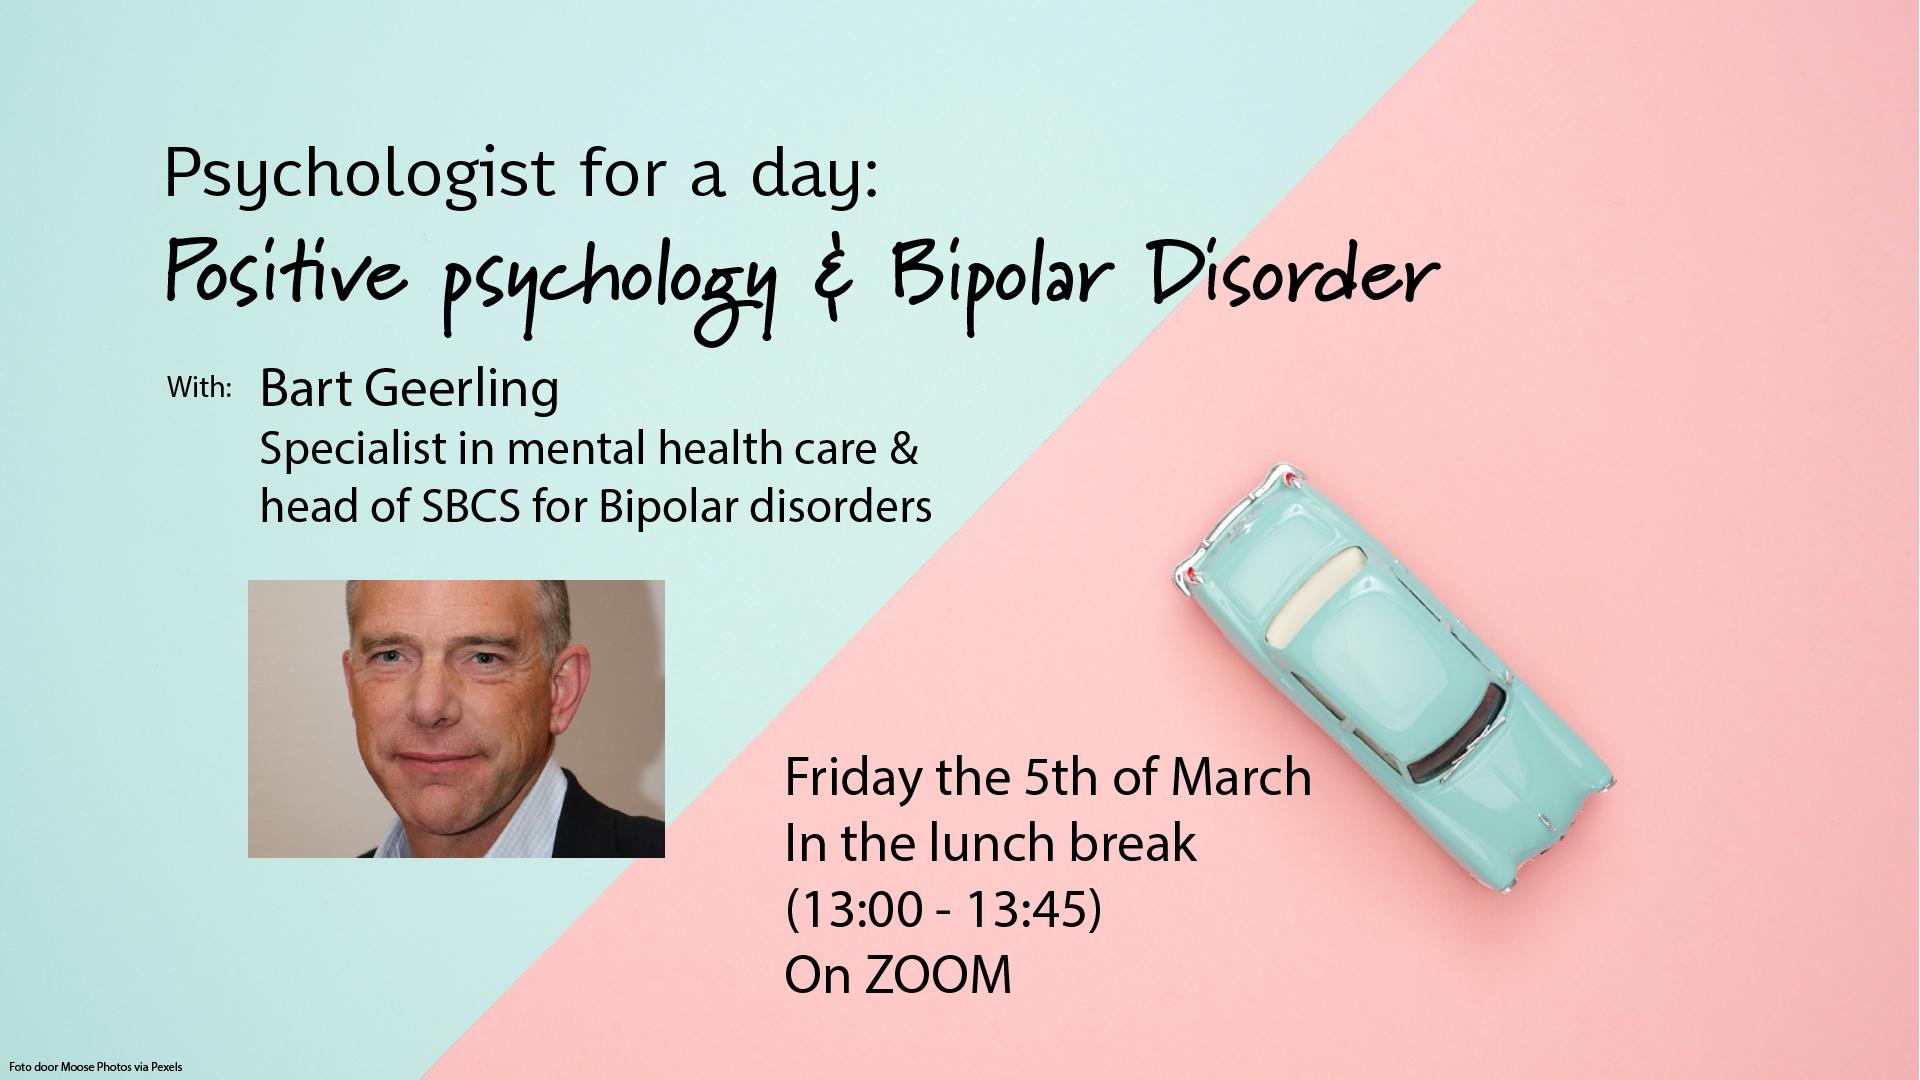 Bipolar Disorder & Positive Psychology: Psychologist for a Day